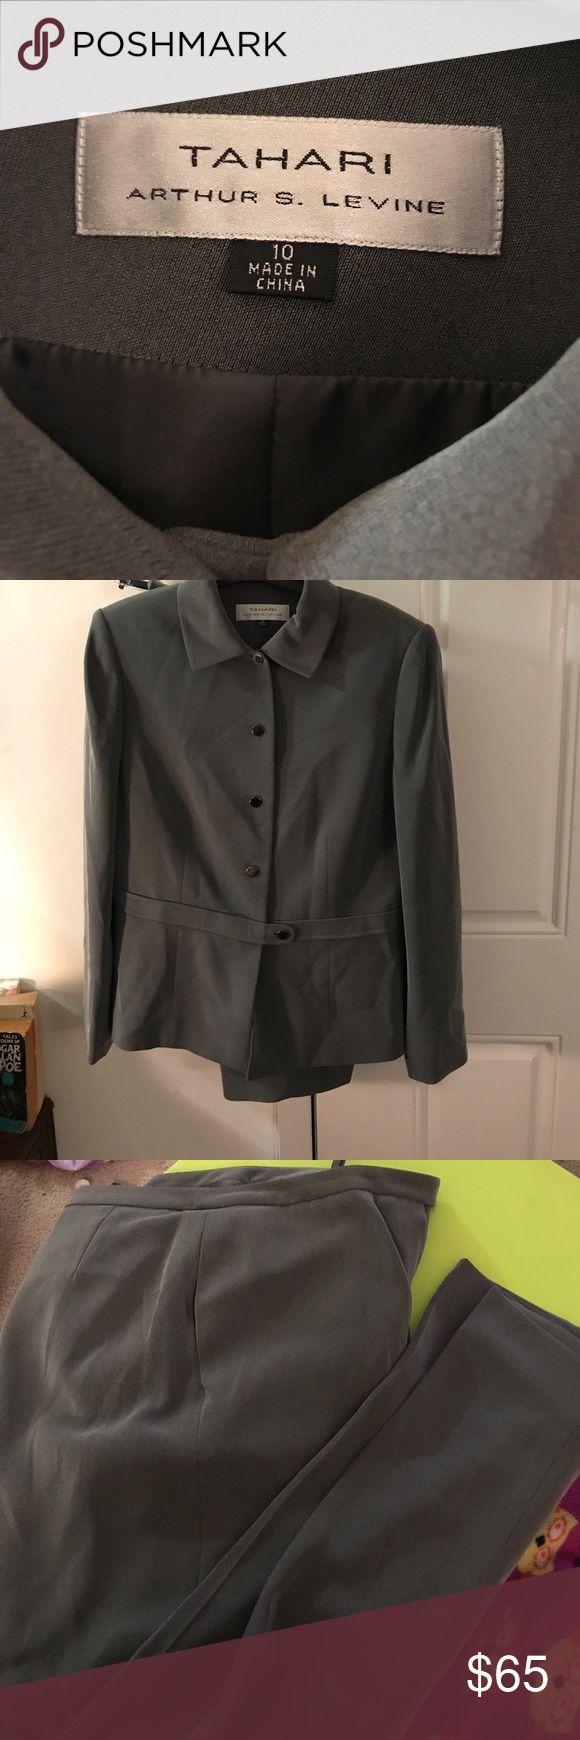 Tahari suit for sale ! Barley worn two piece suit (jacket and pants) Tahari Jackets & Coats Blazers